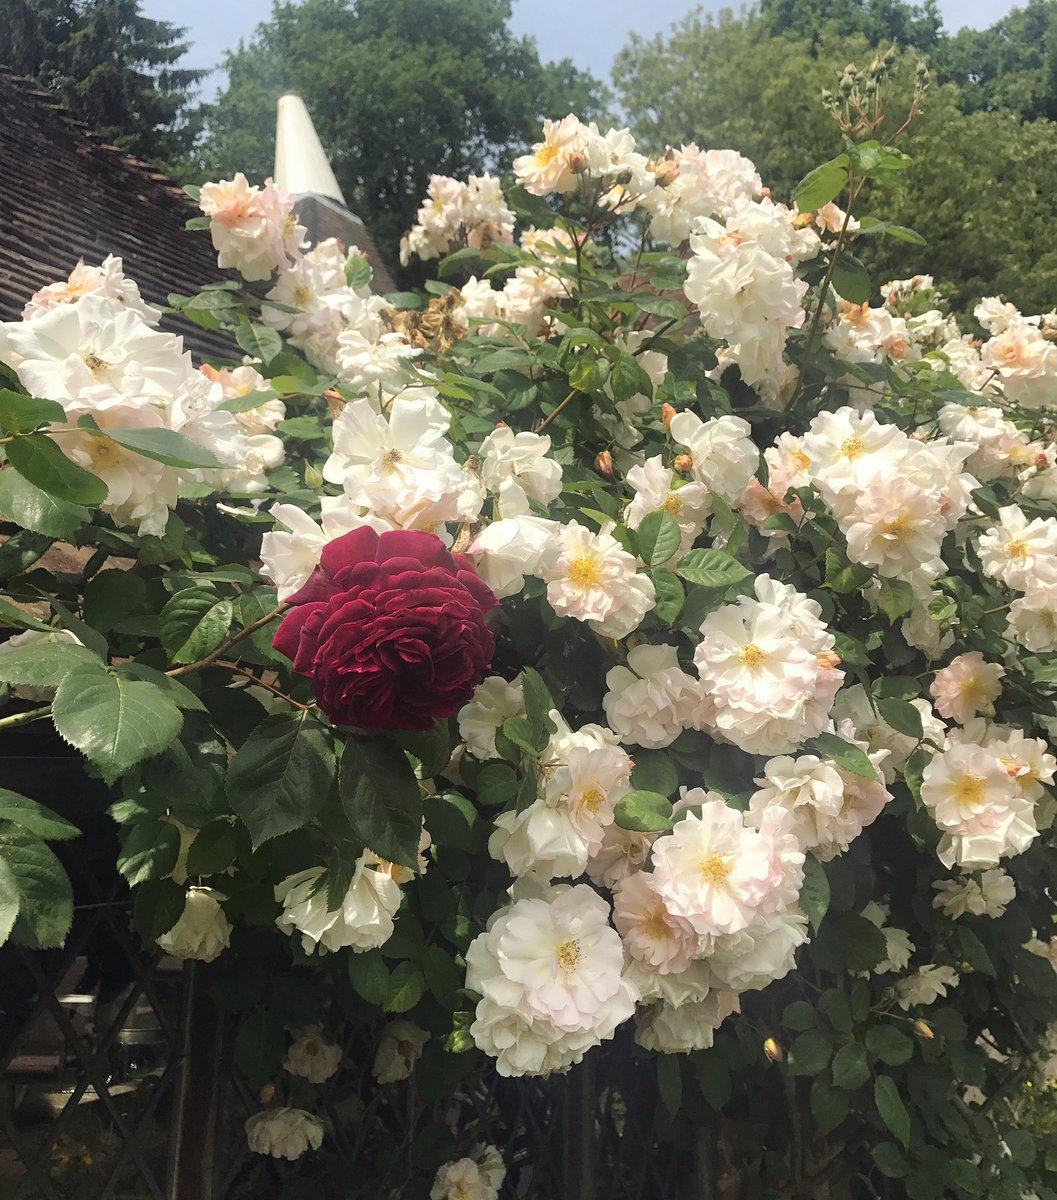 One Climbing Rose Blending into another ???? https://t.co/nK49nXWTeF